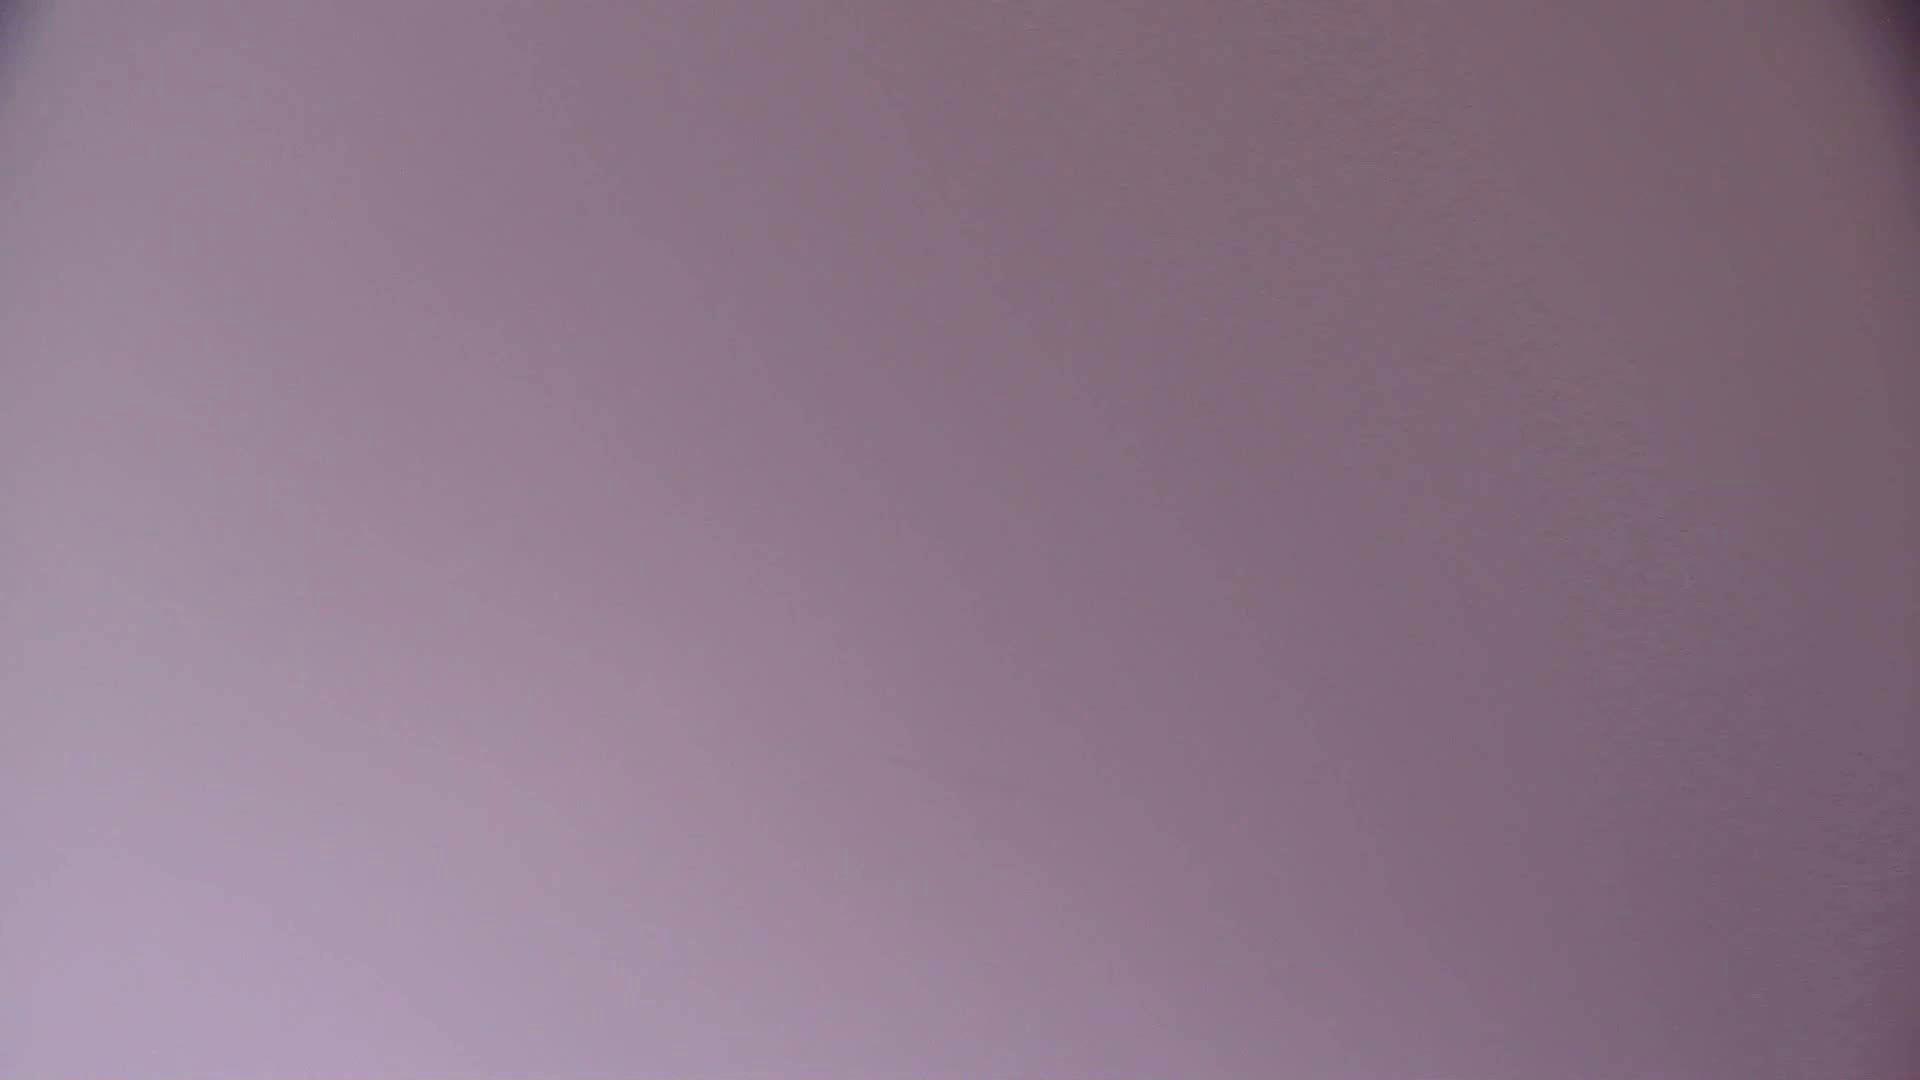 vol.18 命がけ潜伏洗面所! お好みがきっと見つかる 洗面所 性交動画流出 99連発 2